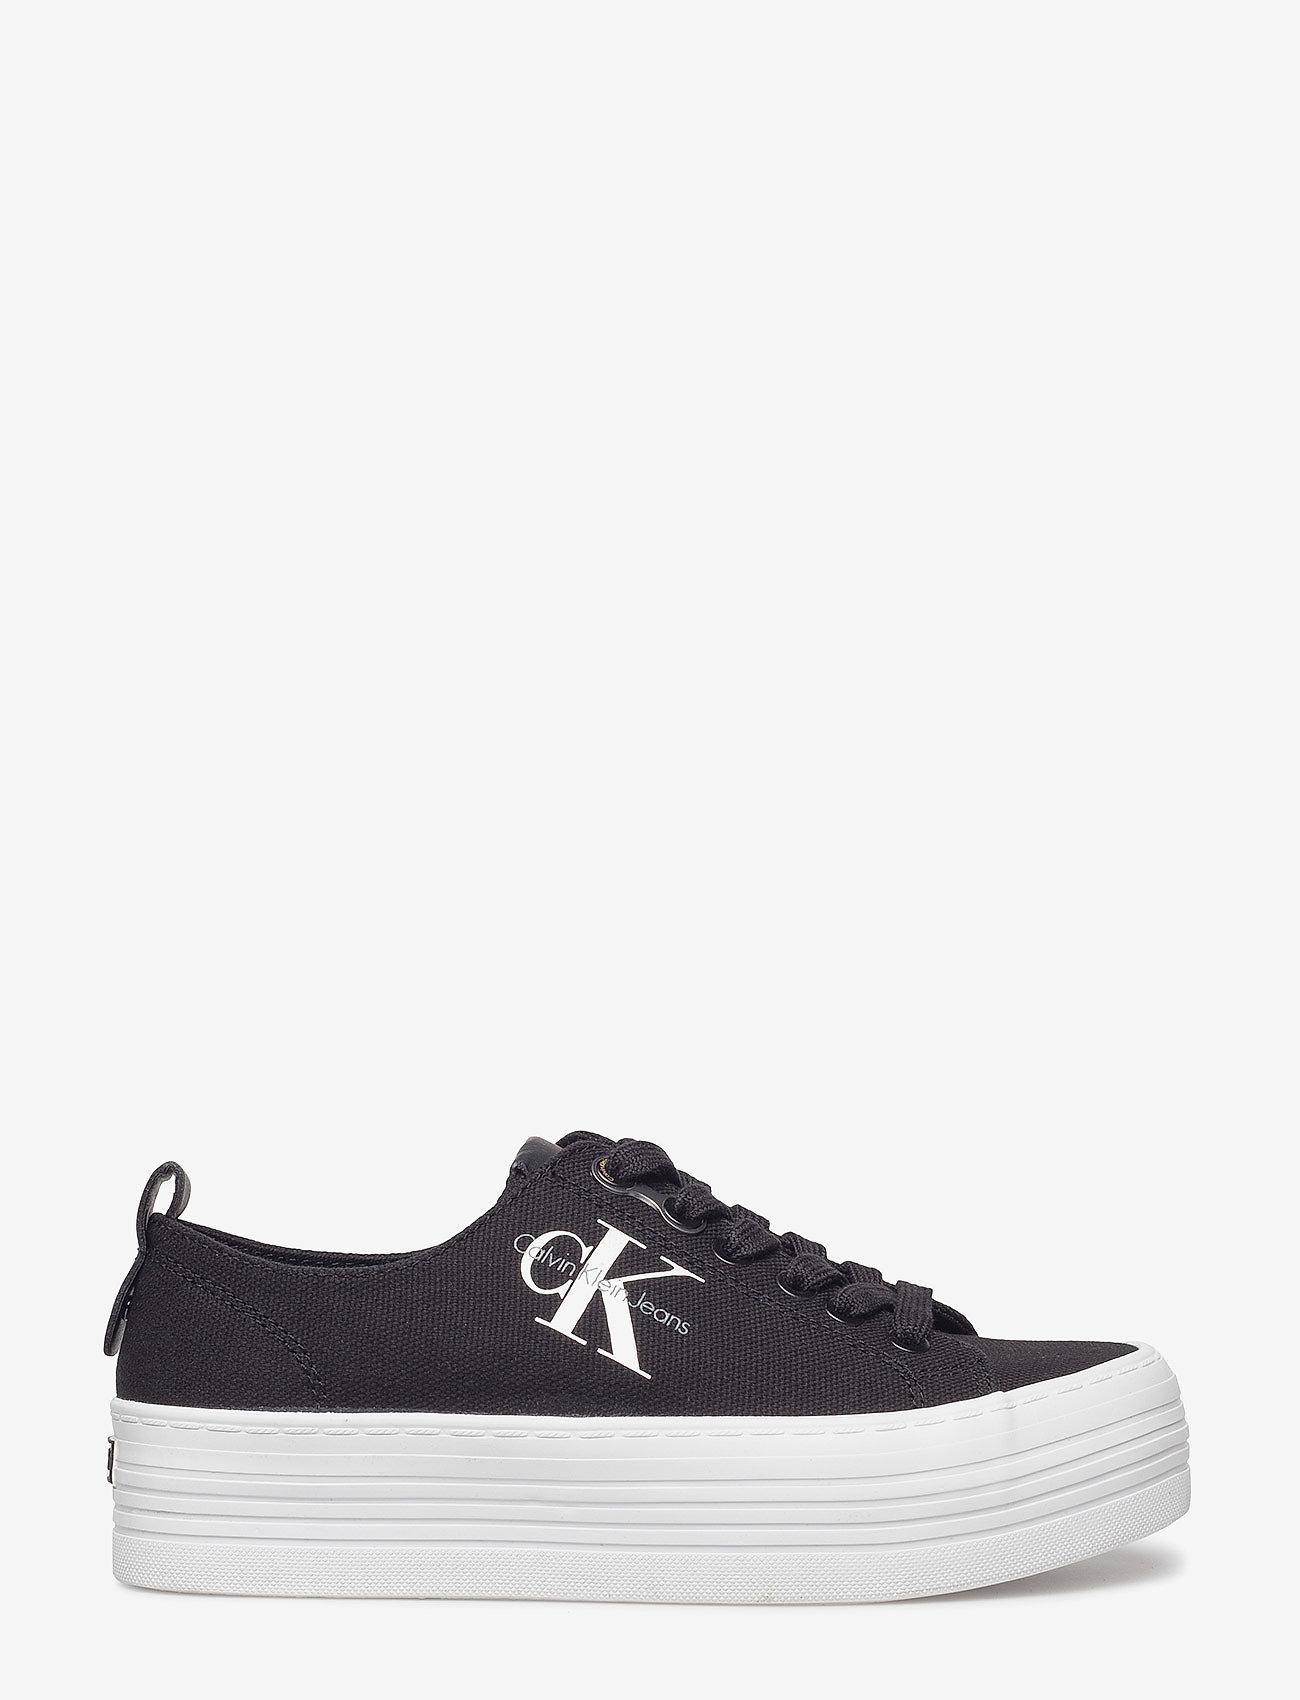 Calvin Klein - ZOLAH / ZOLAH - low top sneakers - blk